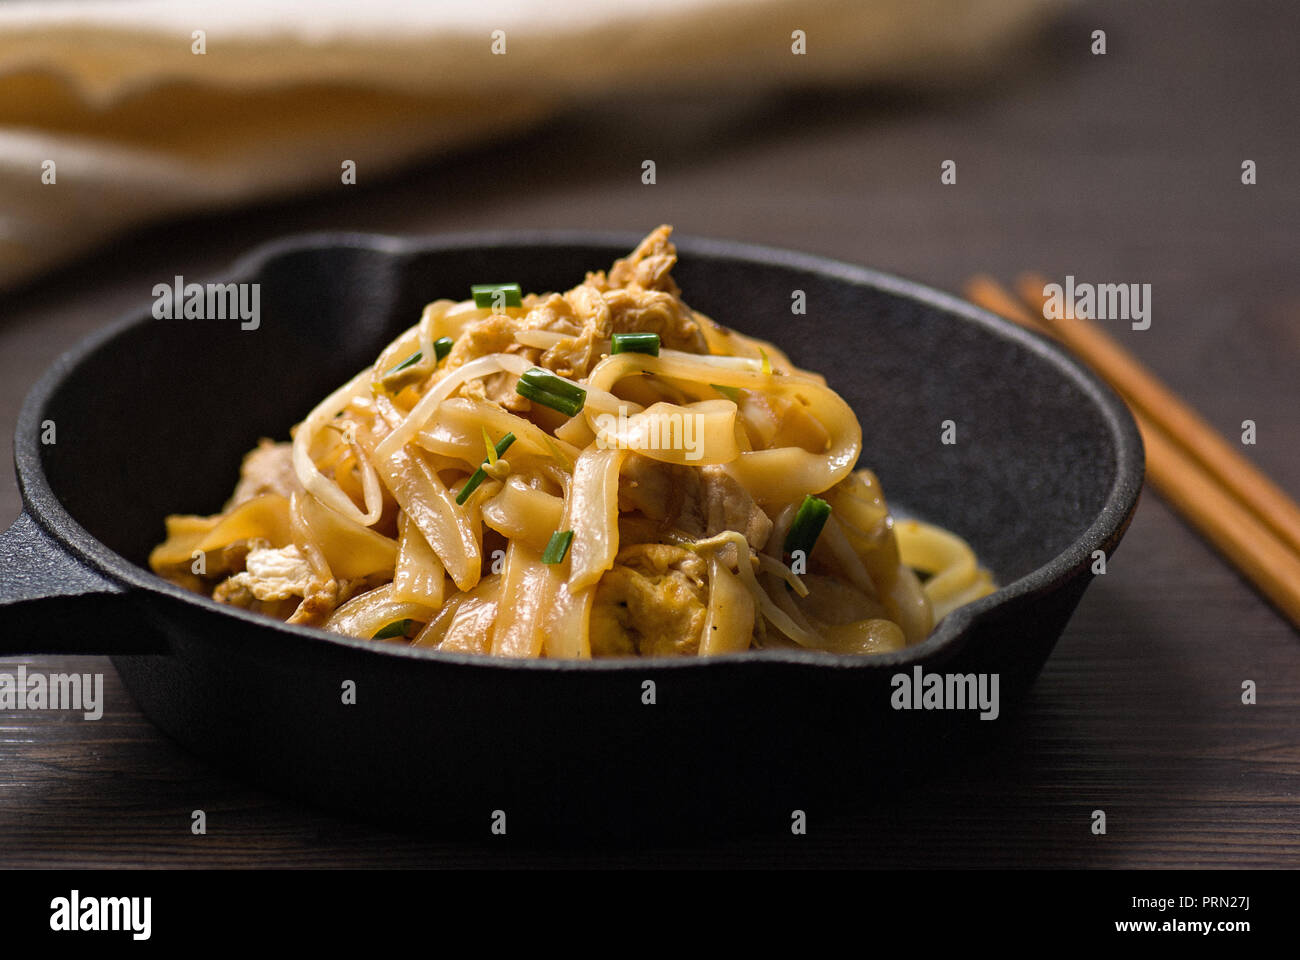 Food Stir fried Rice Noodle Stock Photo